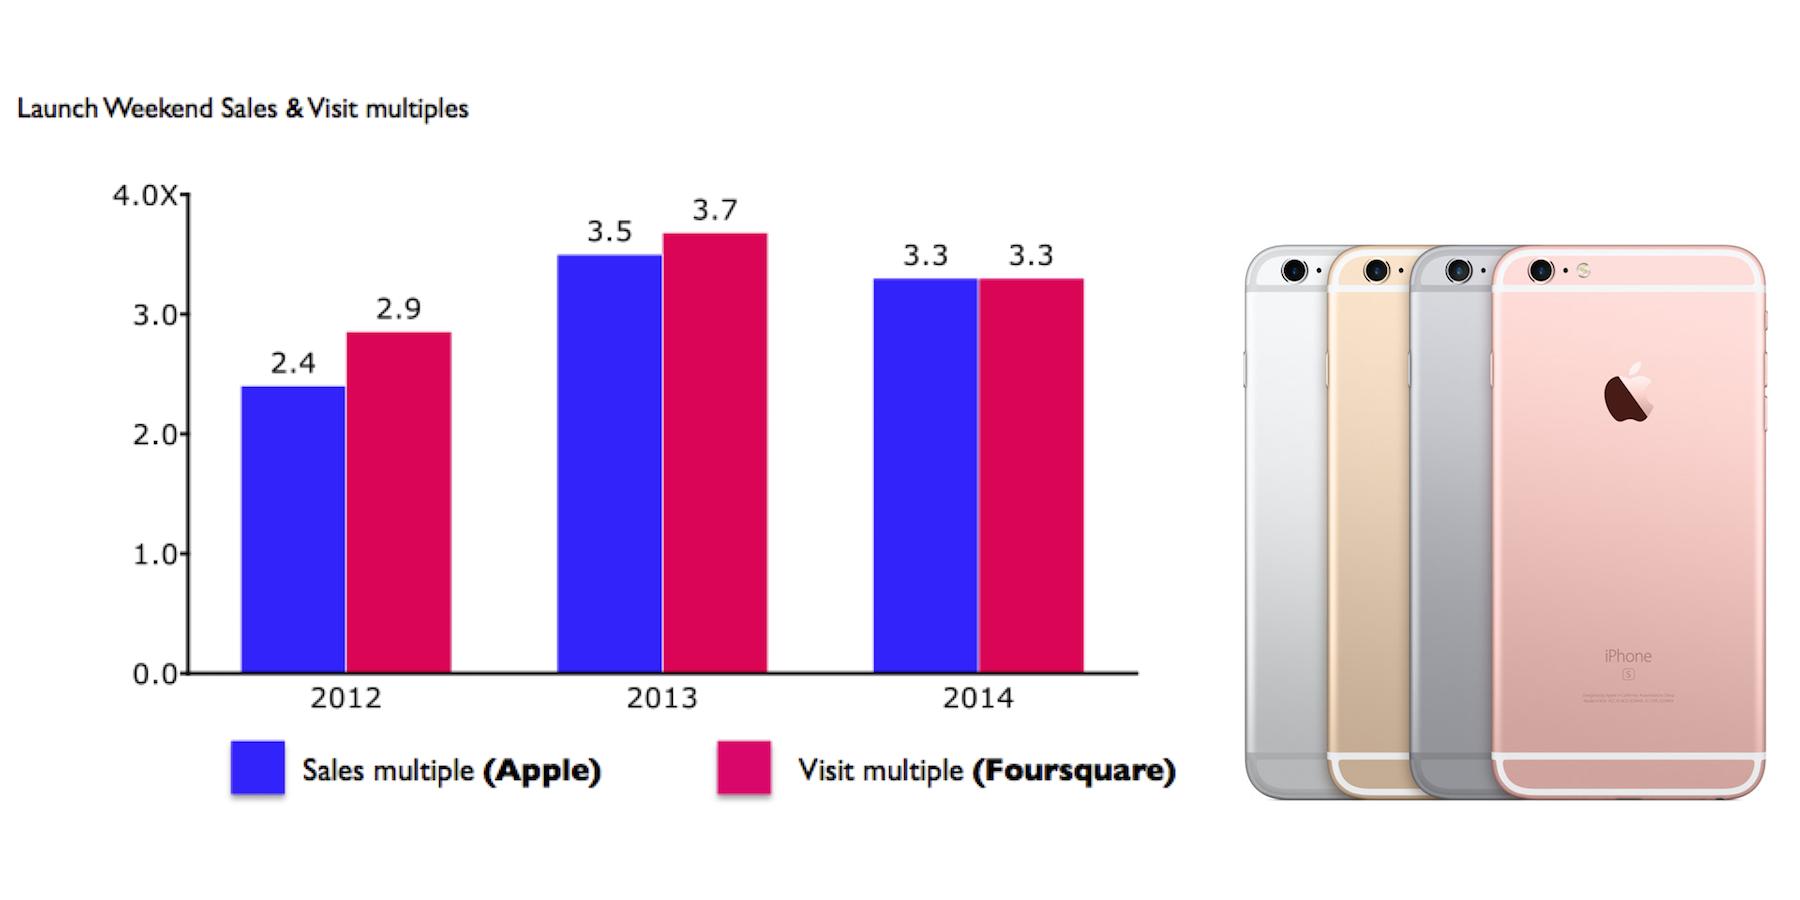 Foursquare-iPhone6s-sales